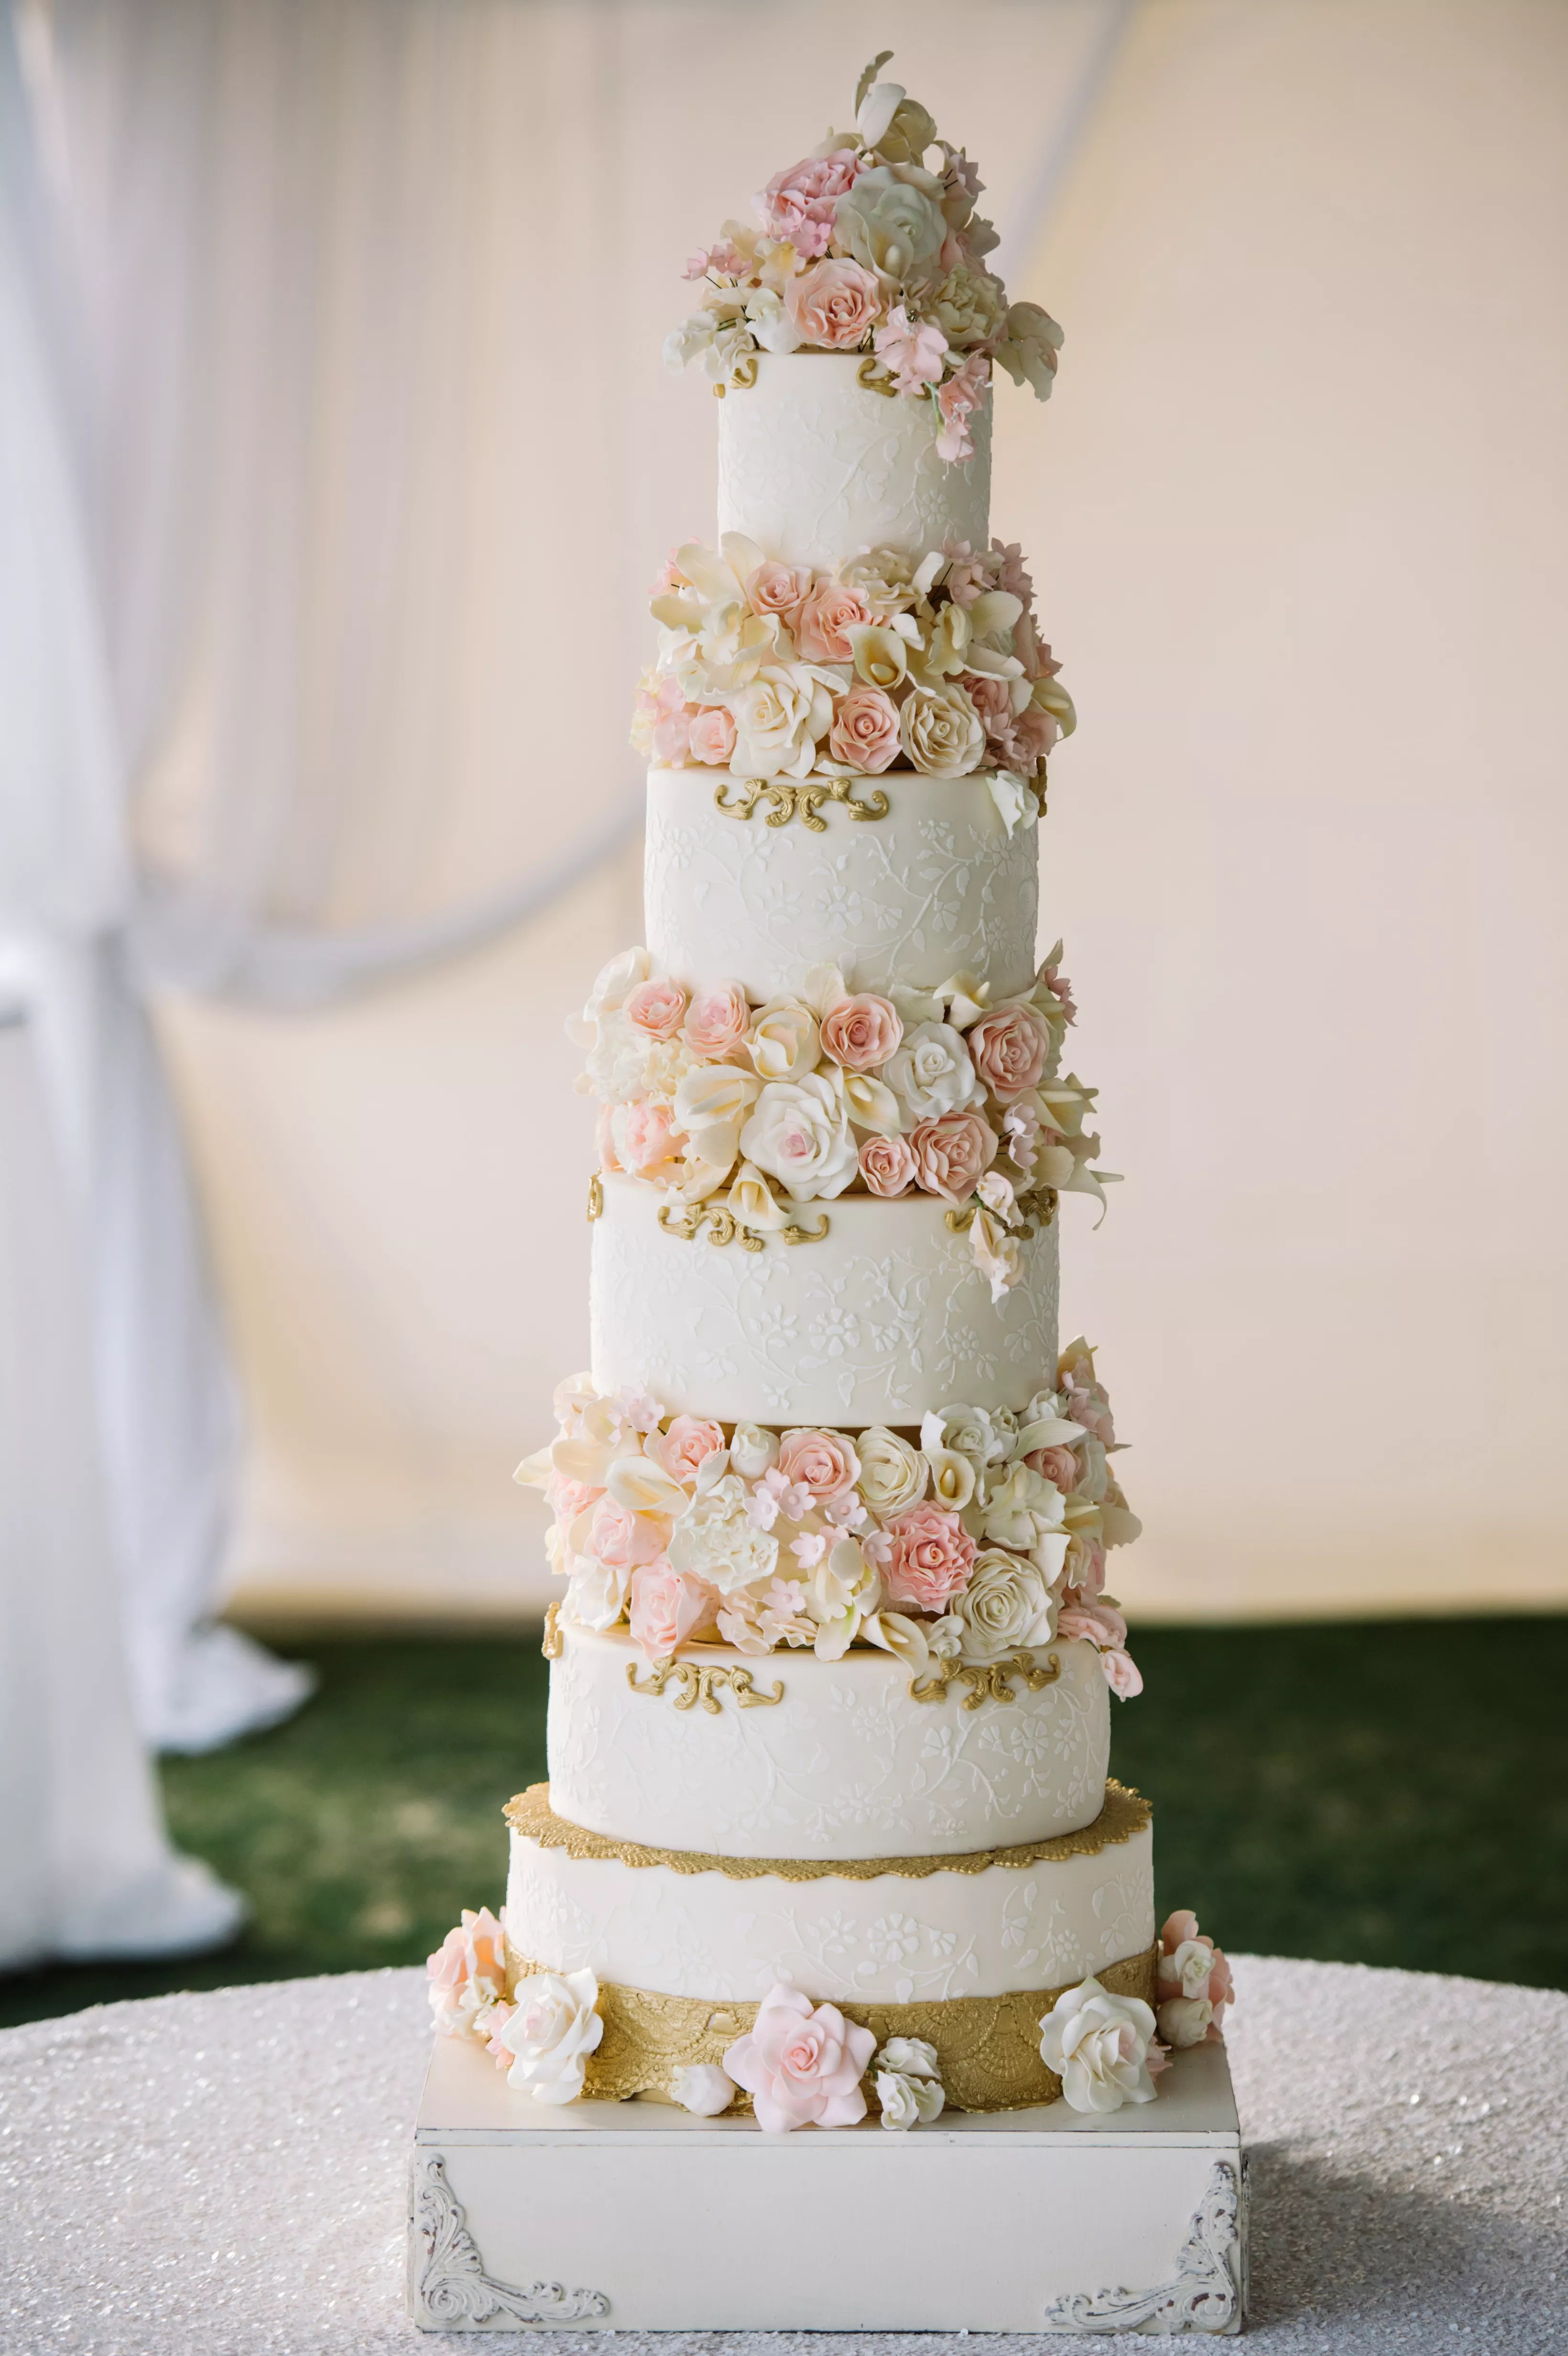 Eight Tier Wedding Cake